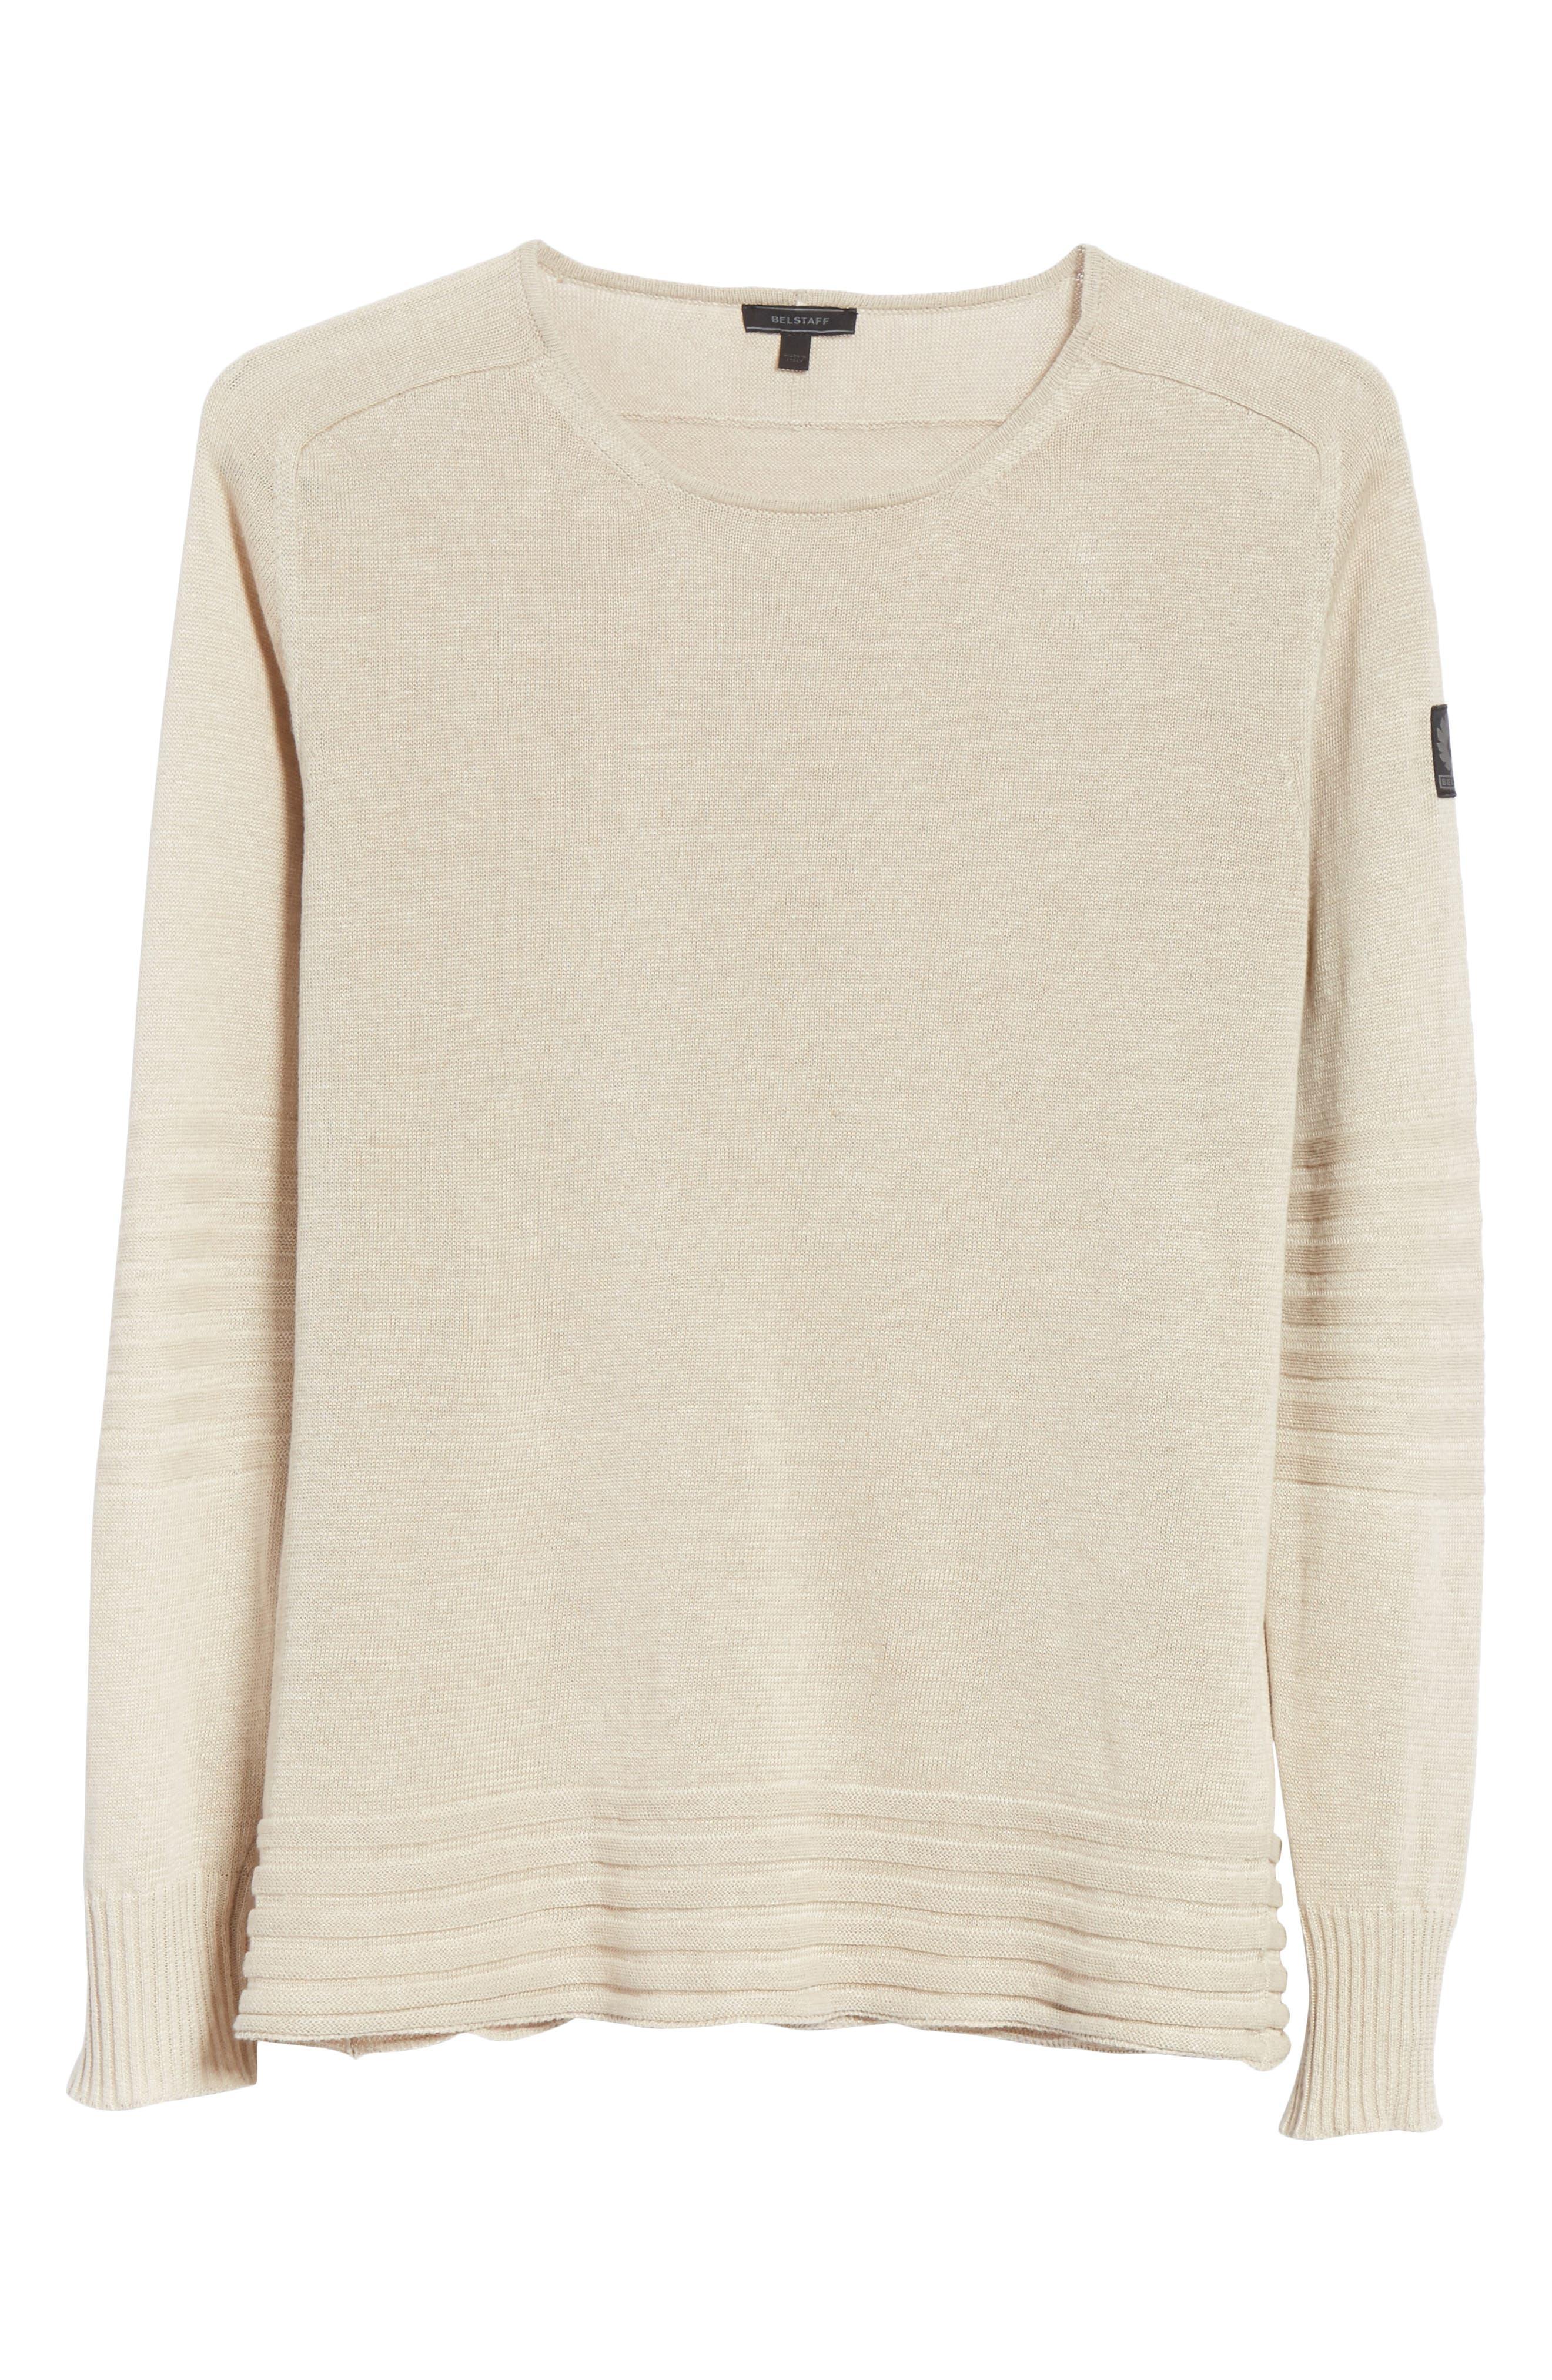 Exford Linen Crewneck Sweater,                             Alternate thumbnail 6, color,                             Light Sand